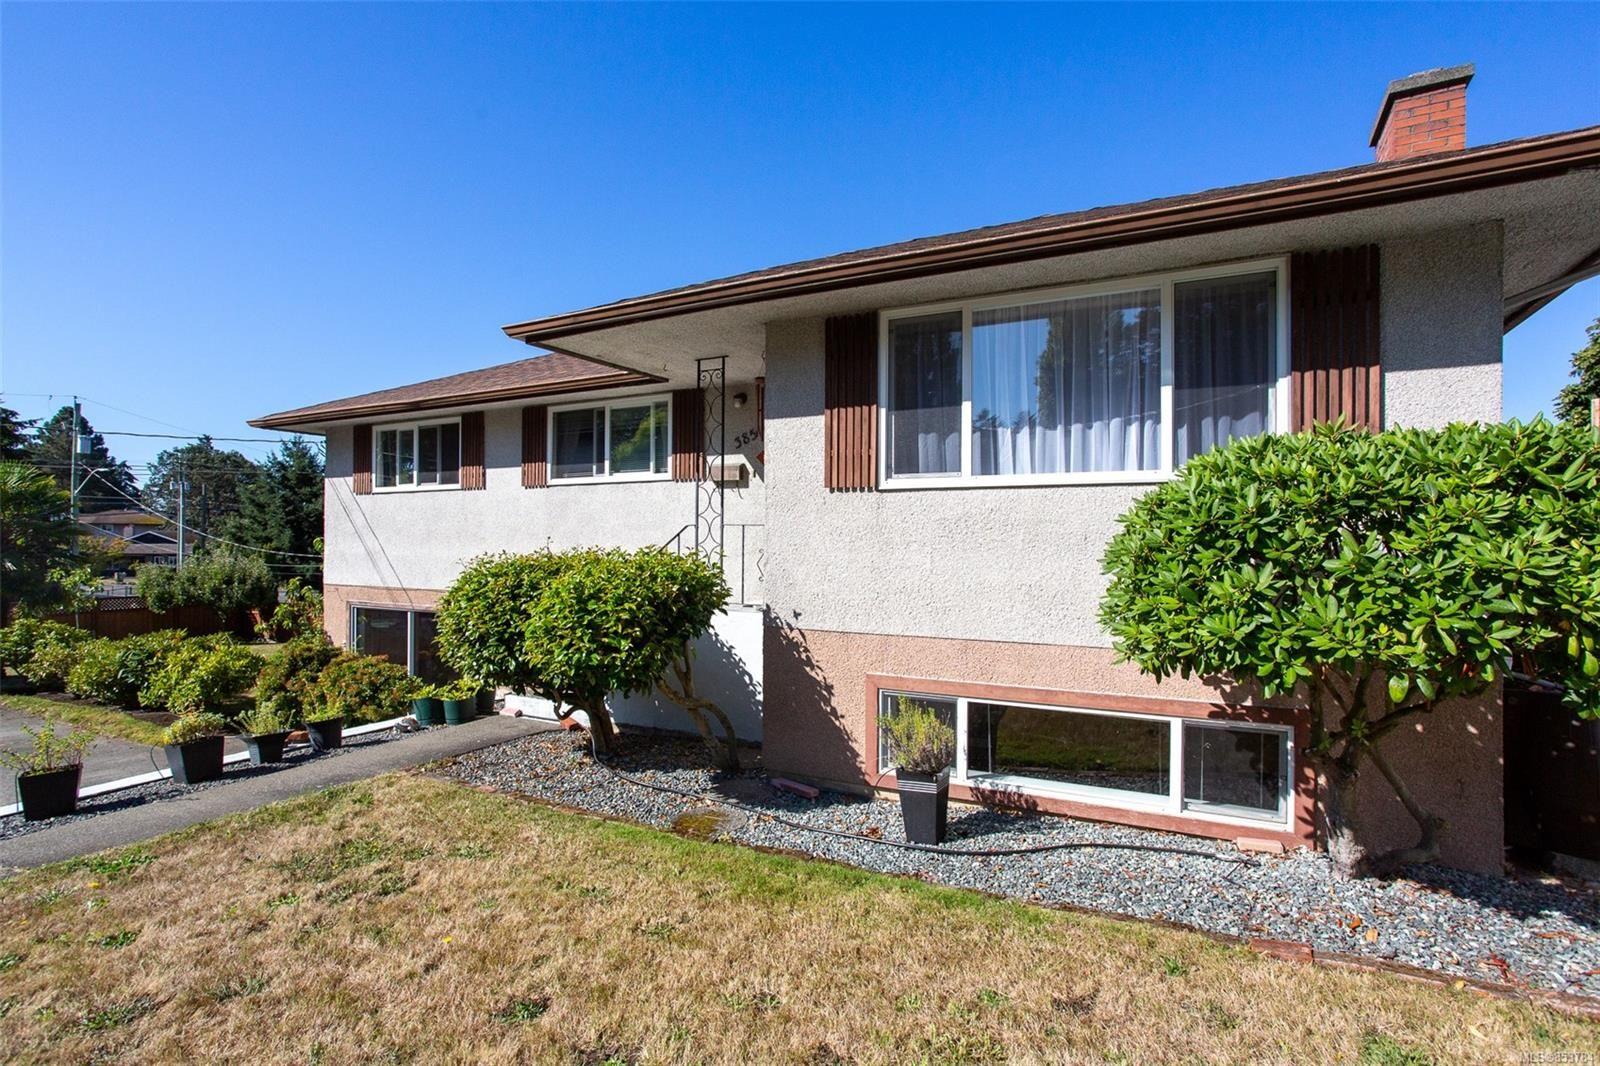 Main Photo: 3851 Merriman Dr in : SE Cedar Hill House for sale (Saanich East)  : MLS®# 853784